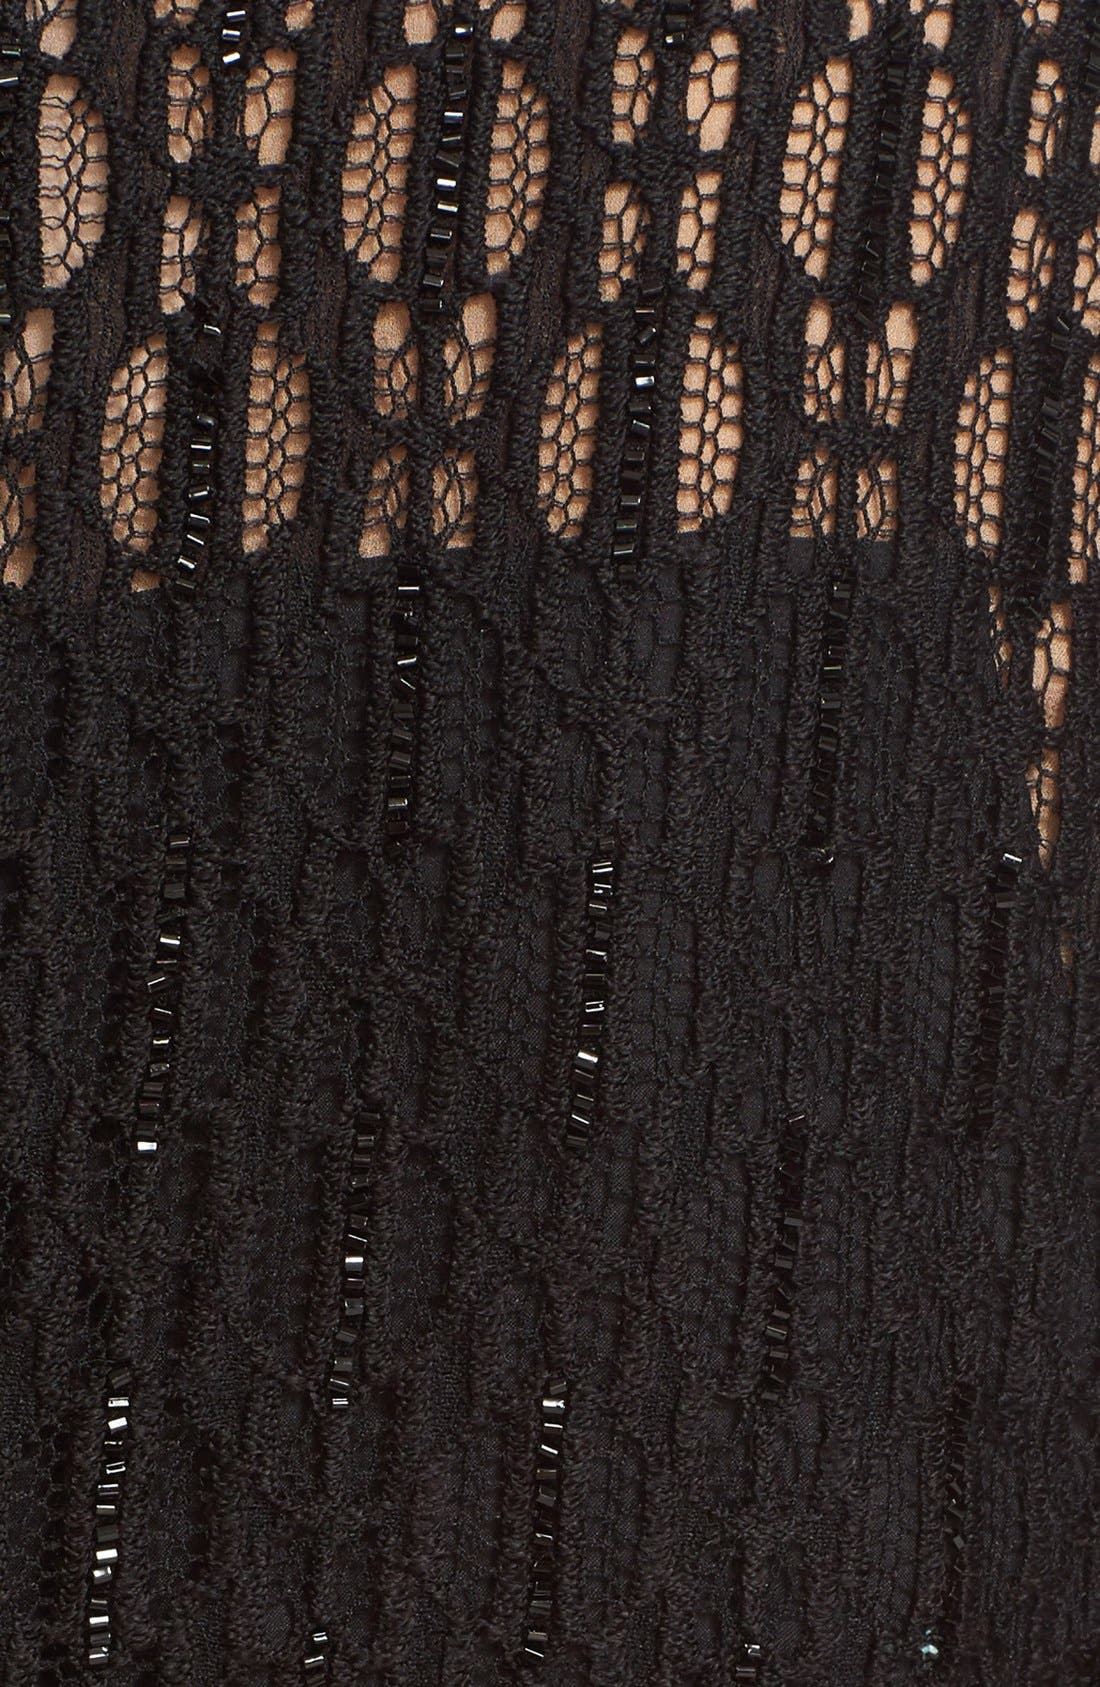 Embellished Illusion Lace Knit Sheath Dress,                             Alternate thumbnail 2, color,                             001